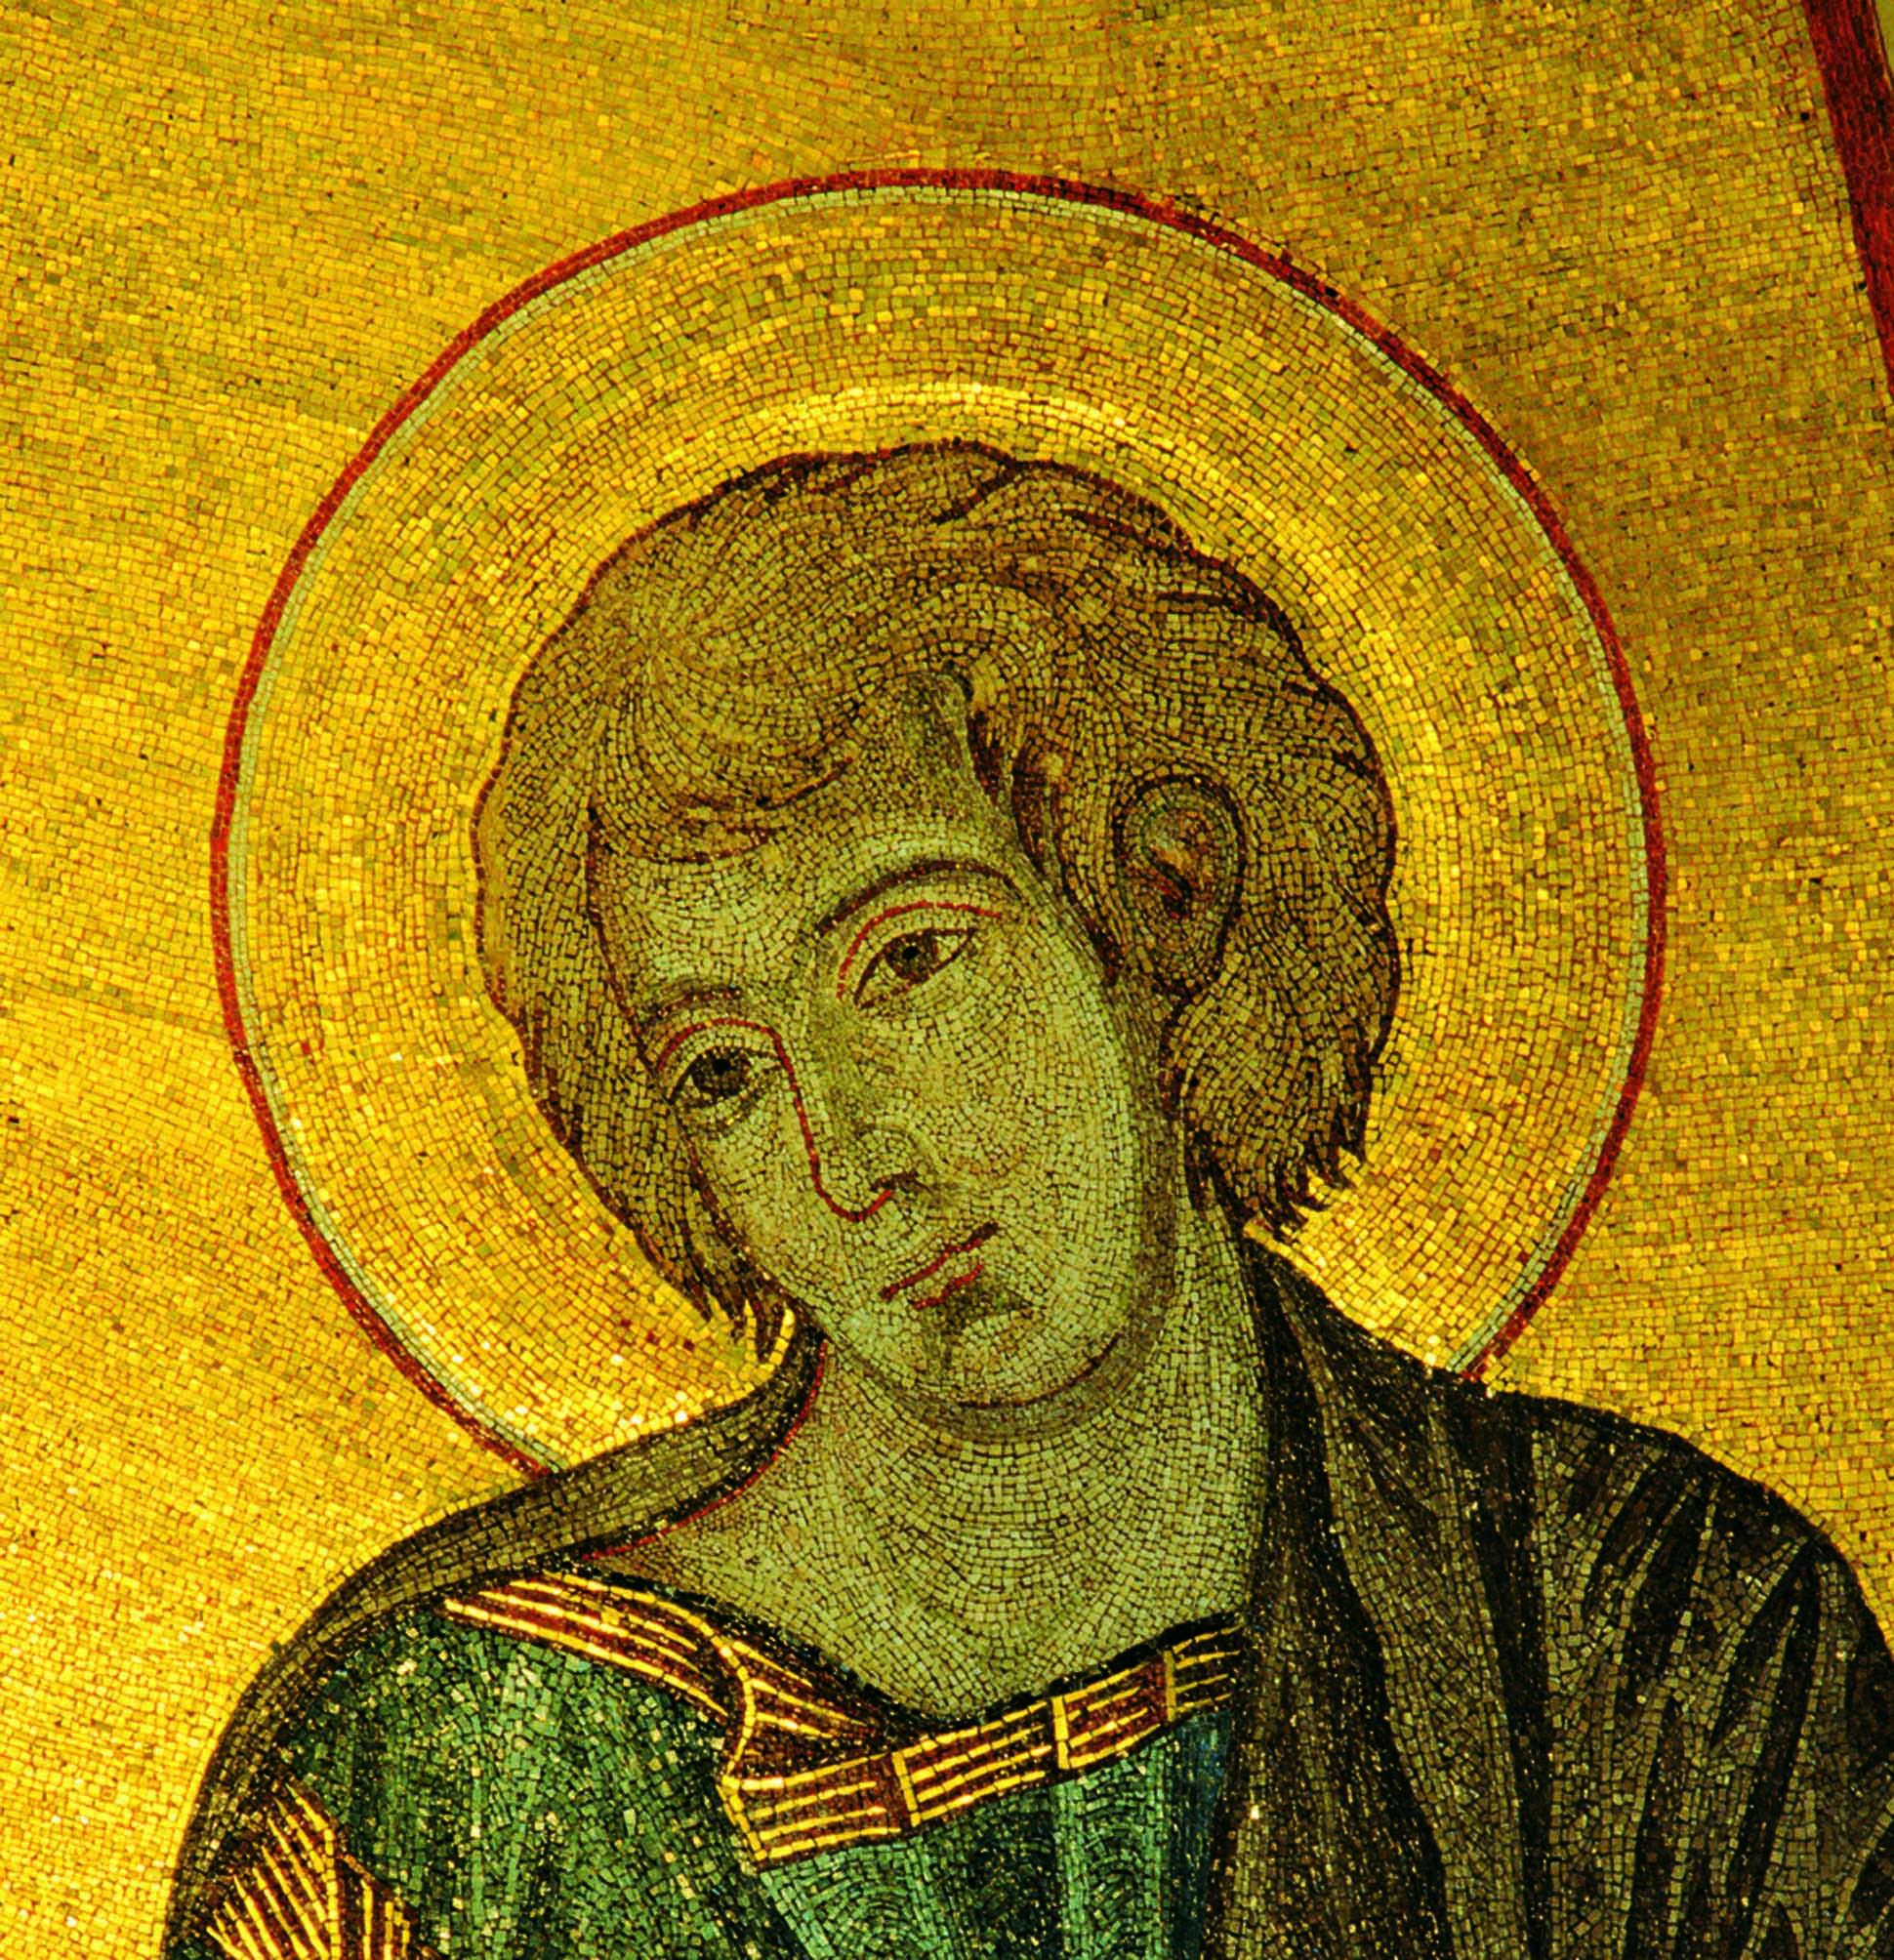 Cimabue, Mosaico absidale con San Giovanni Evangelista (particolare), Duomo di Pisa